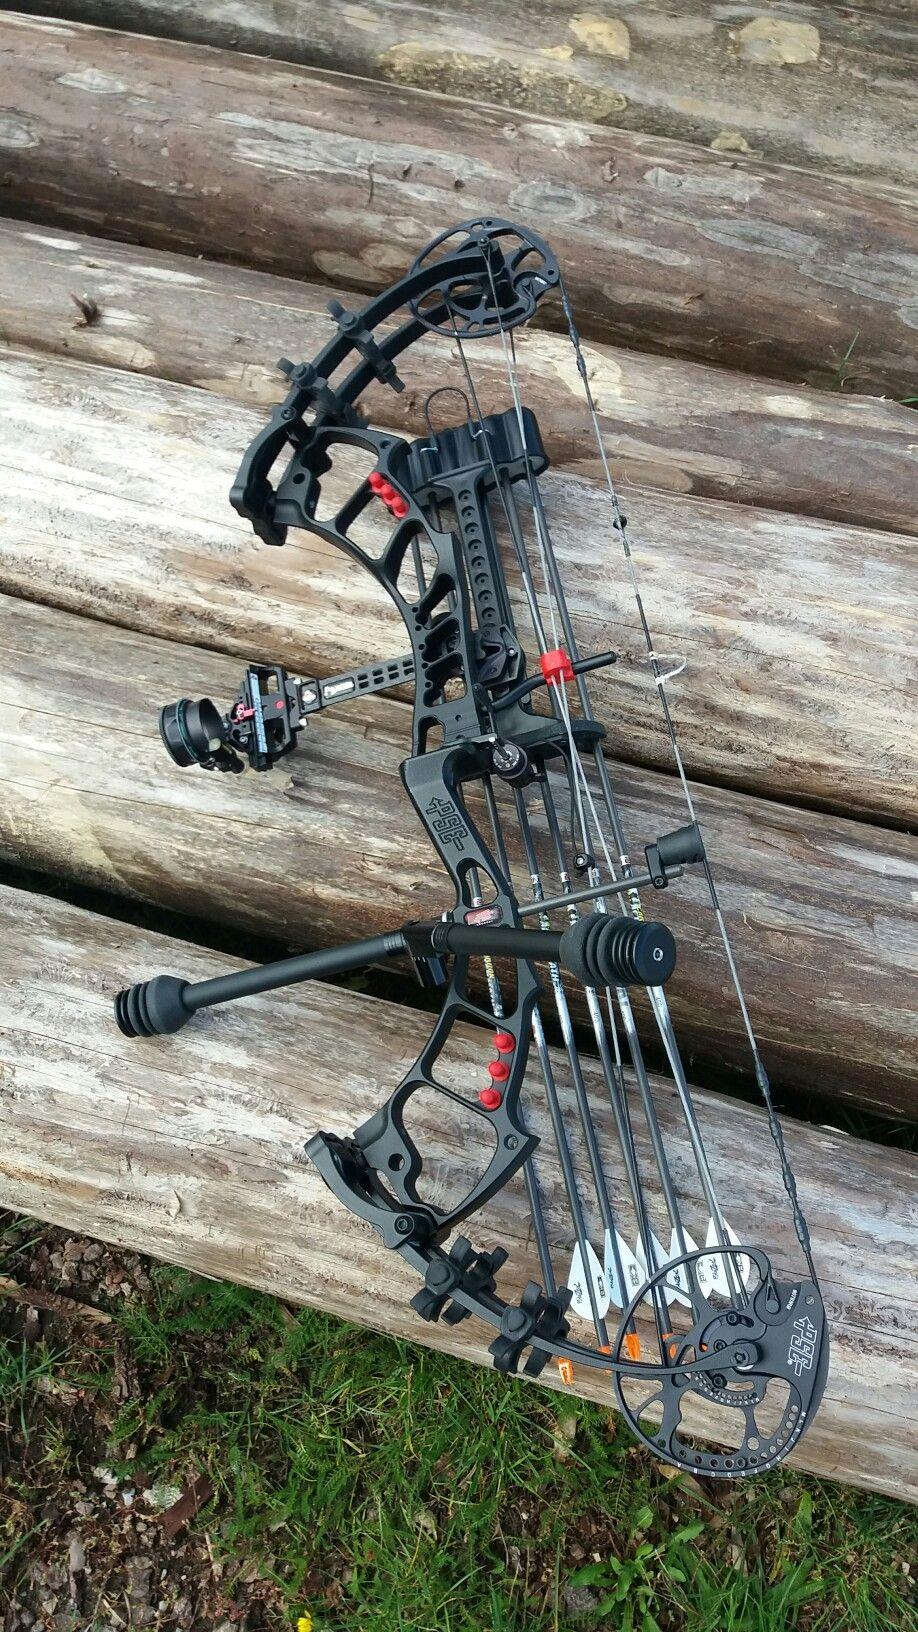 PSE Bow Madness Epix Pse bow madness, Pse bows, Bow hunting